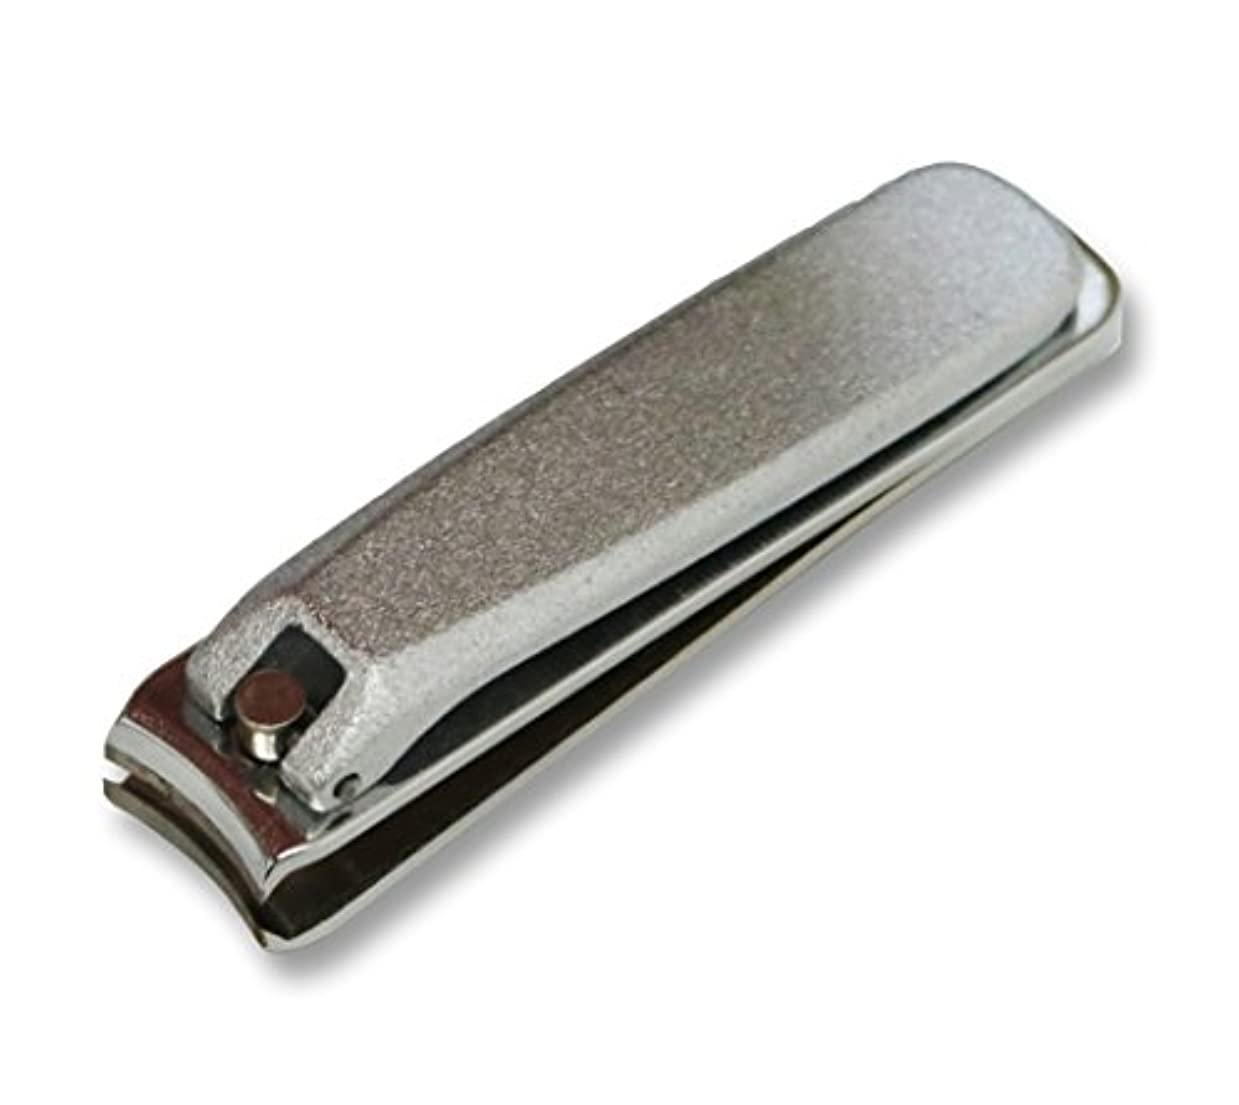 KD-021 関の刃物 クローム爪切 大 カバー無